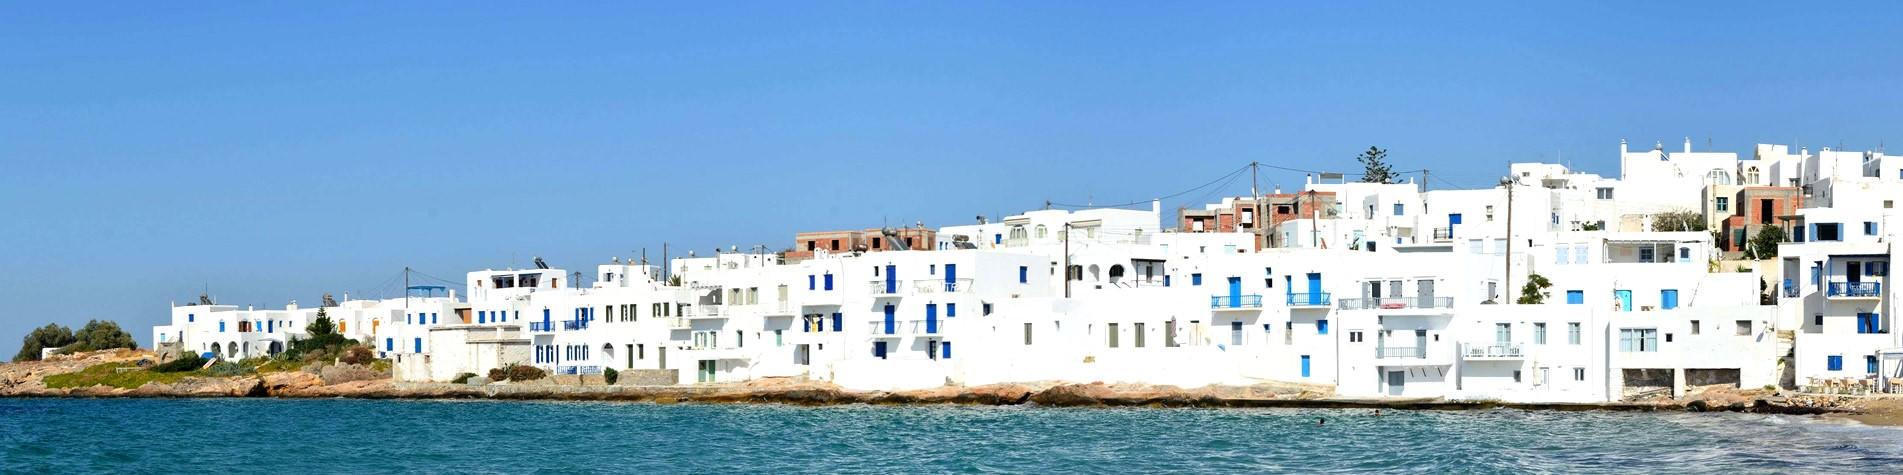 Paros Island Holidays with Cyplon Holidays